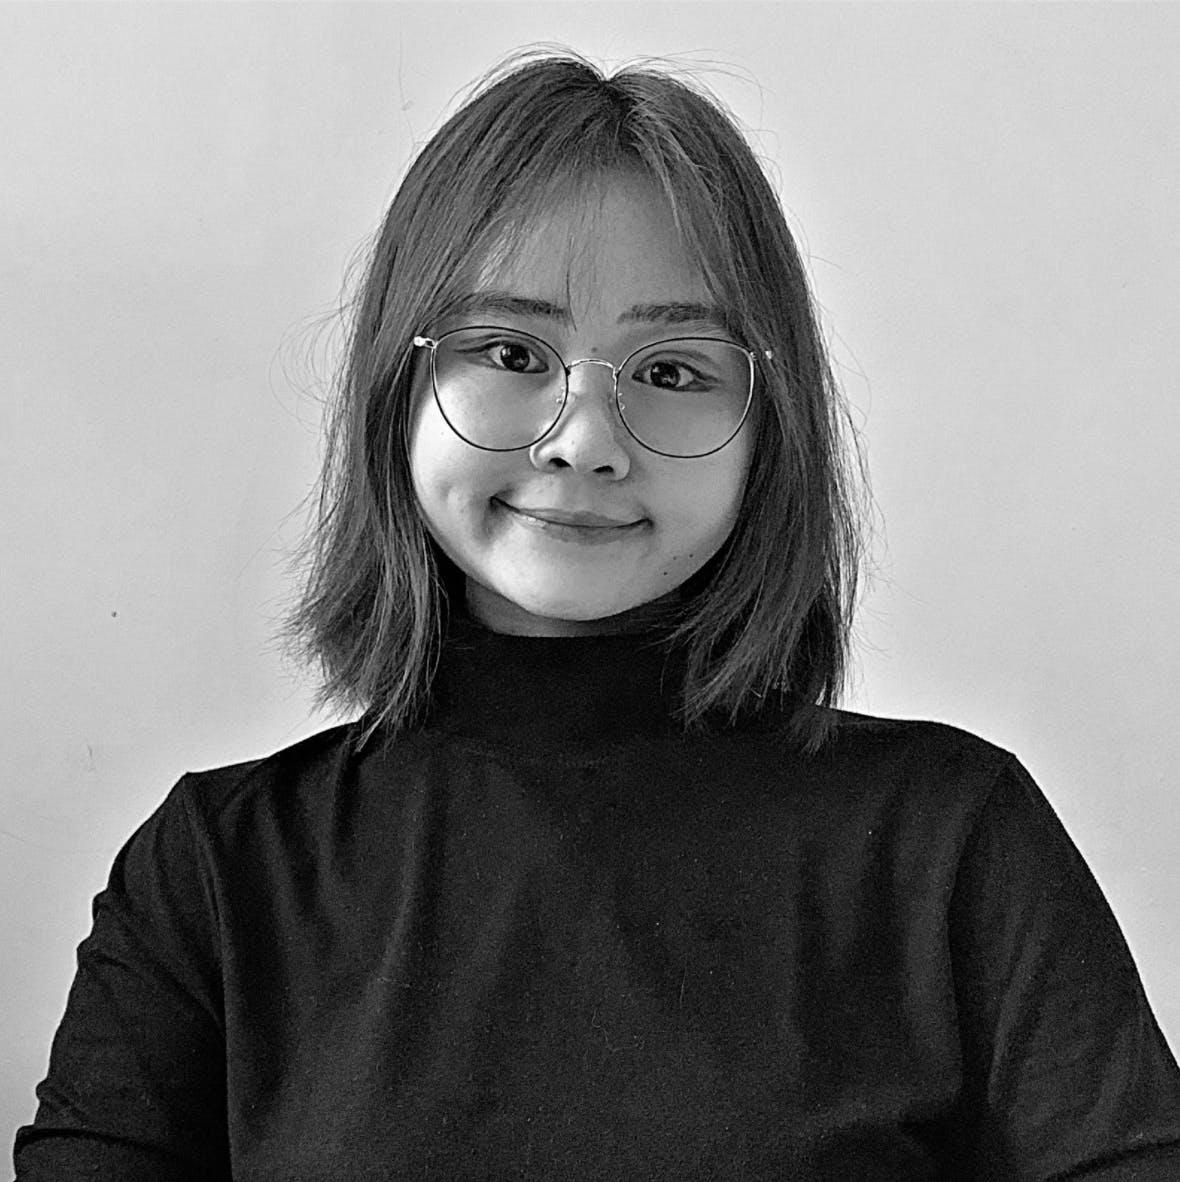 Angeline Darmawan